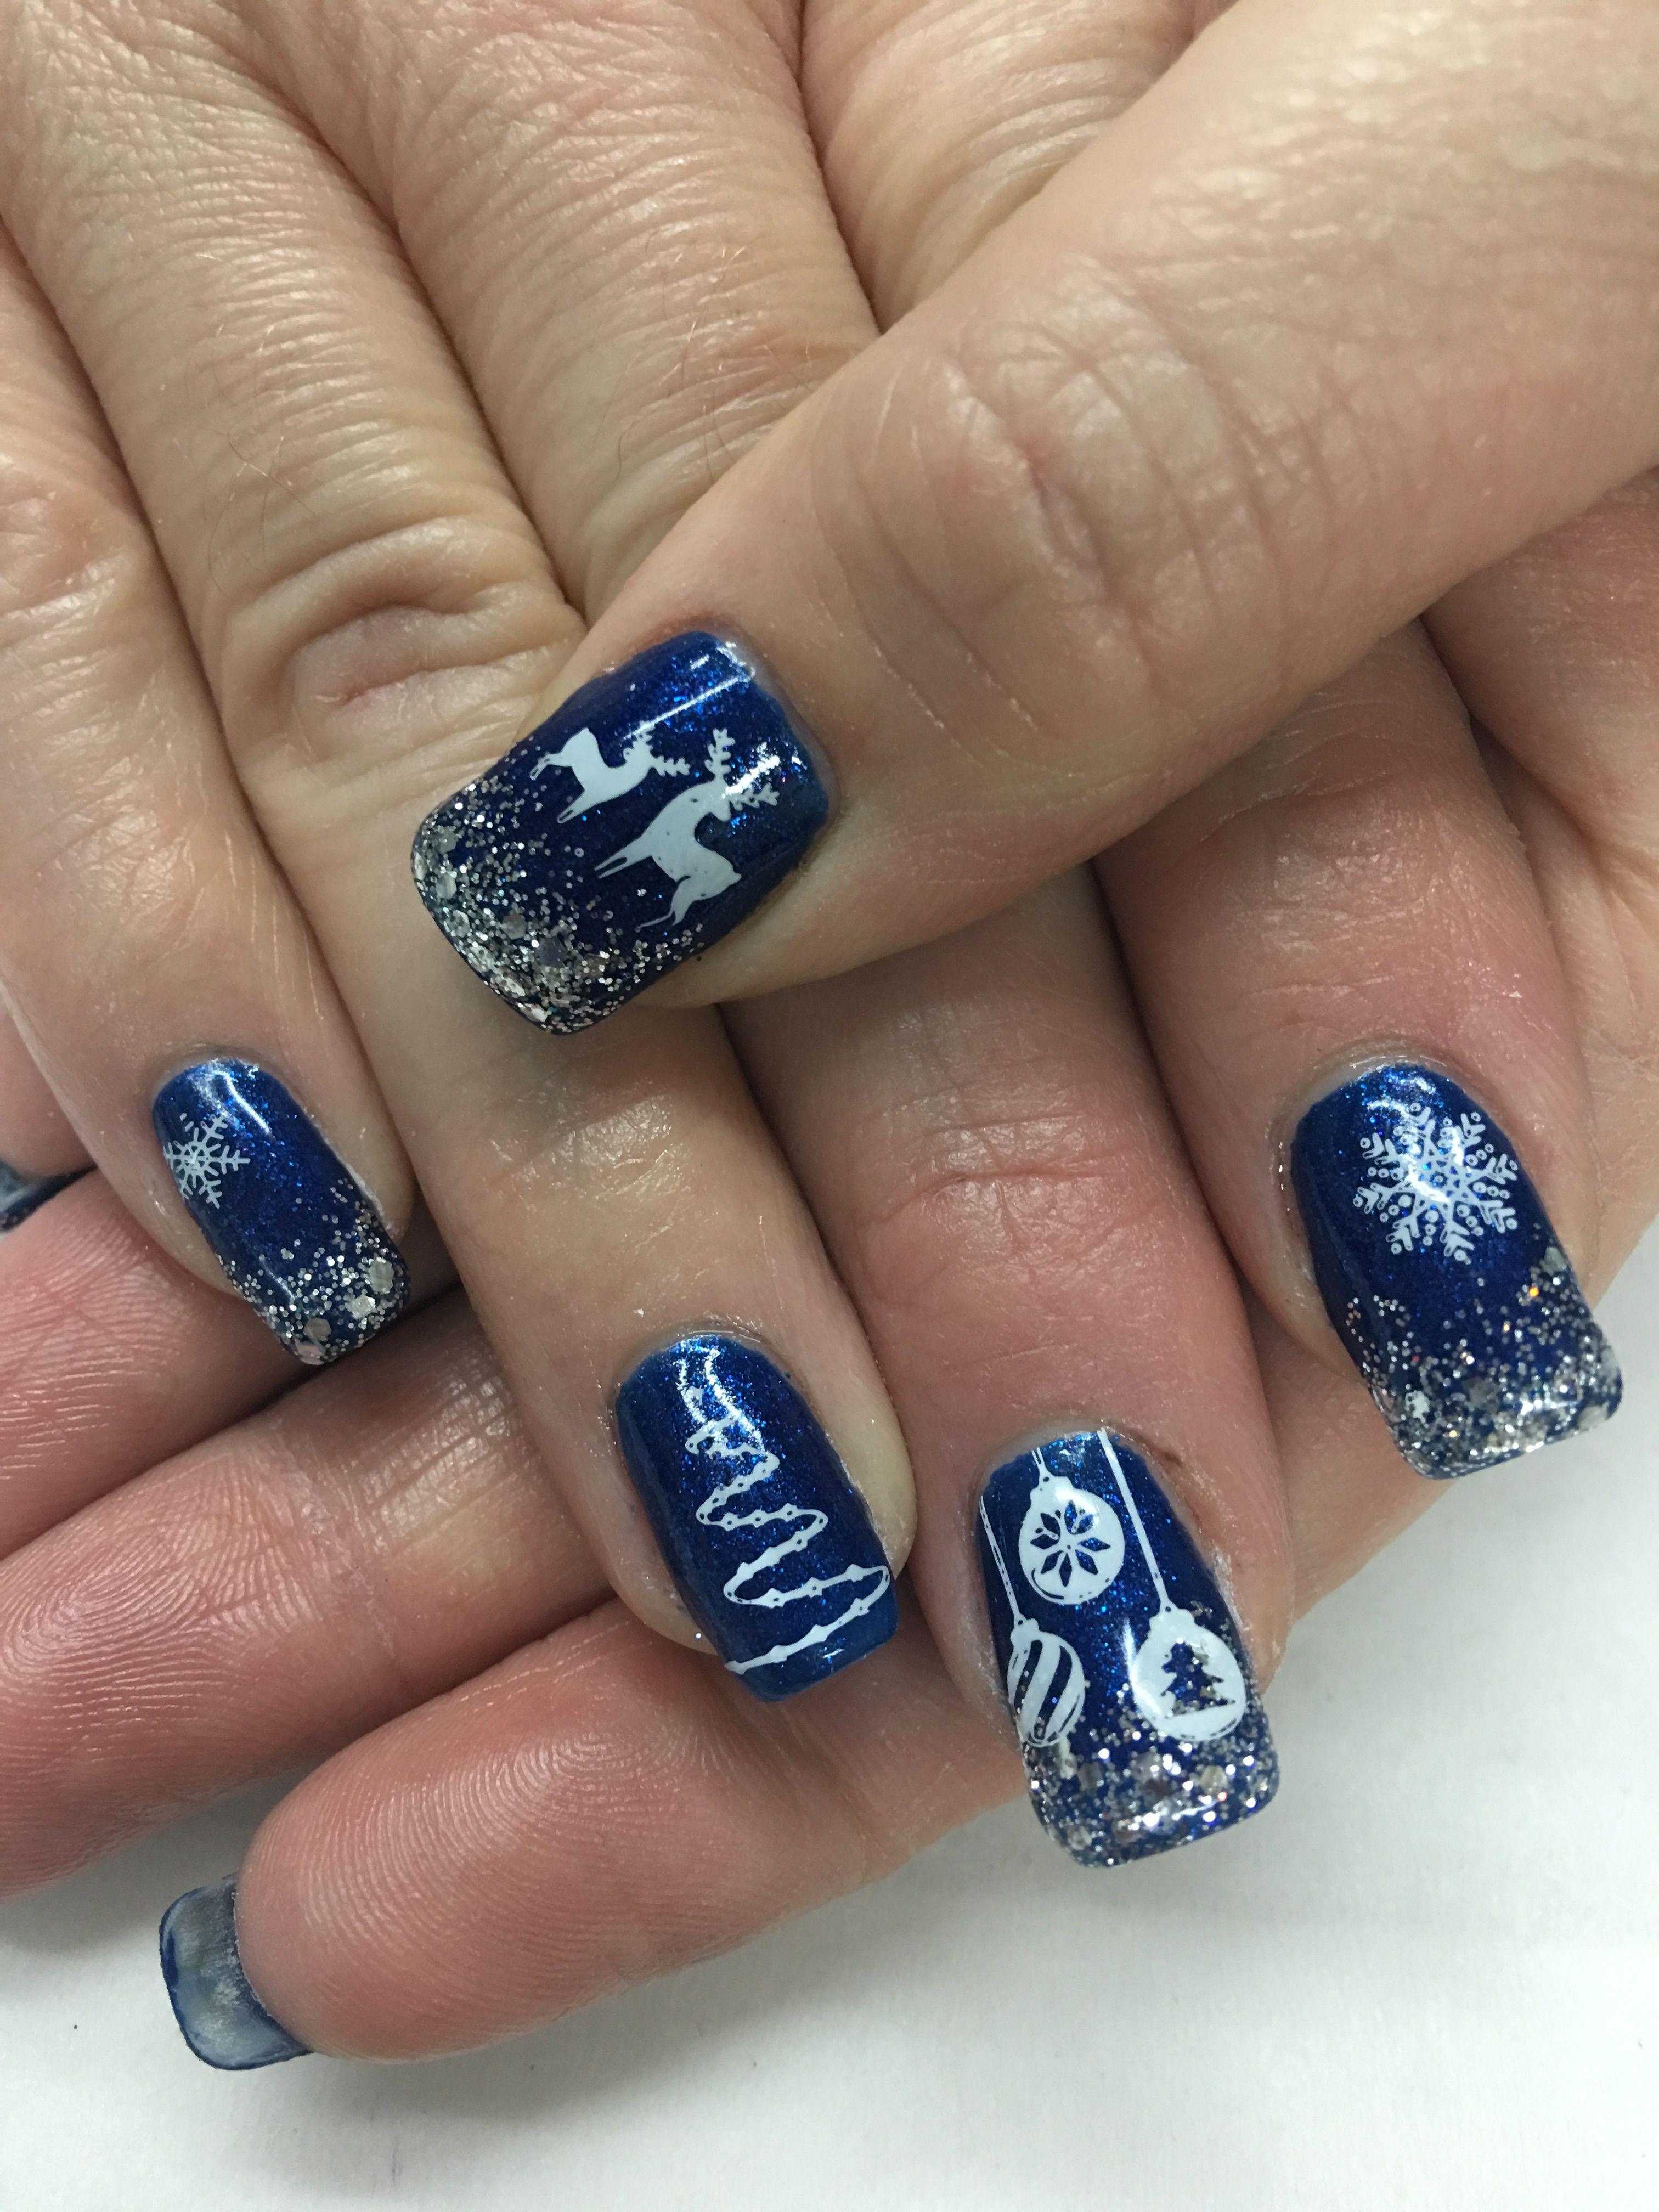 Royal Blue Christmas Ornament Deer Snowflakes Gel Nails Nails Gel Nails Royal Blue Nails